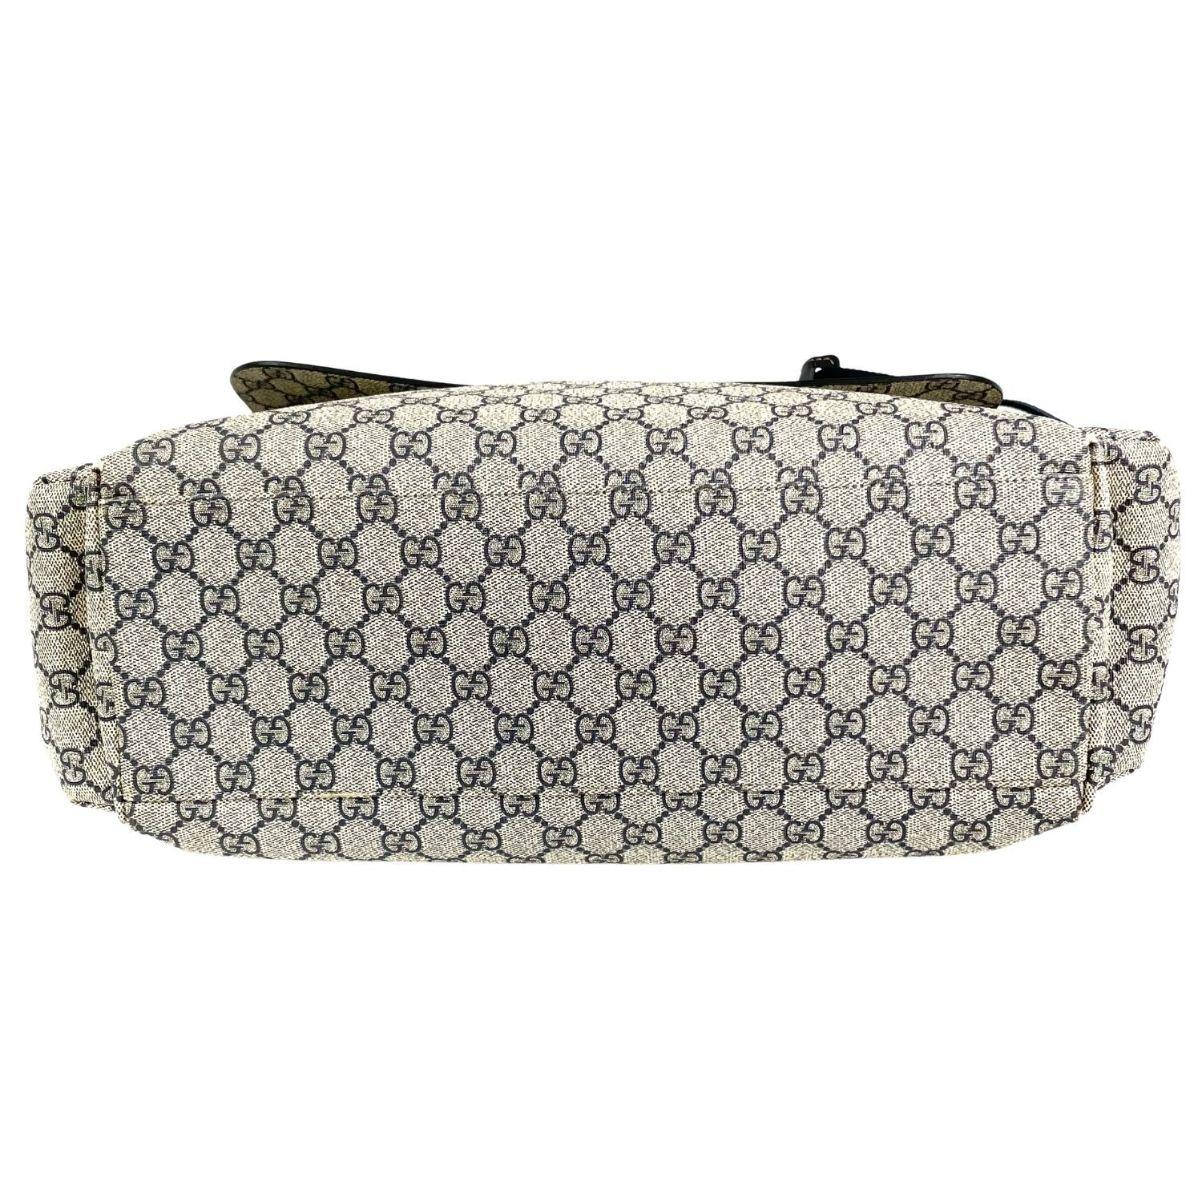 Bolsa Gucci Diaper Bag Monograma